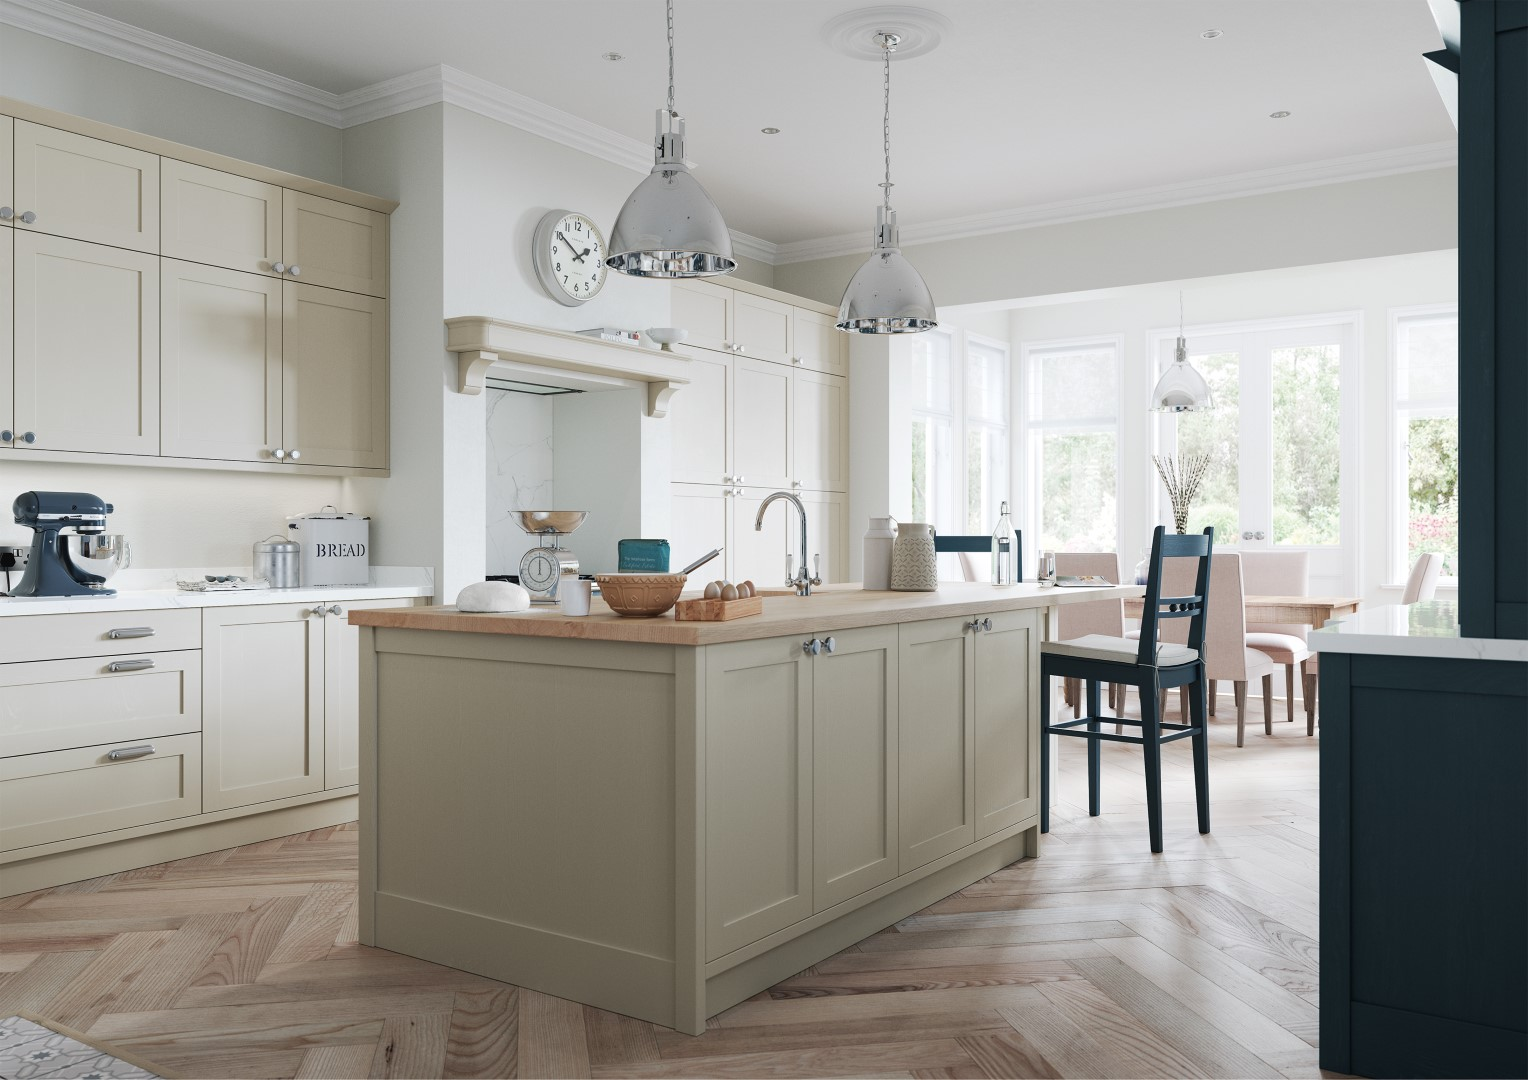 Aldana Stone and Marine - Kitchen Design - Alan Kelly Kitchens - Waterford - 1